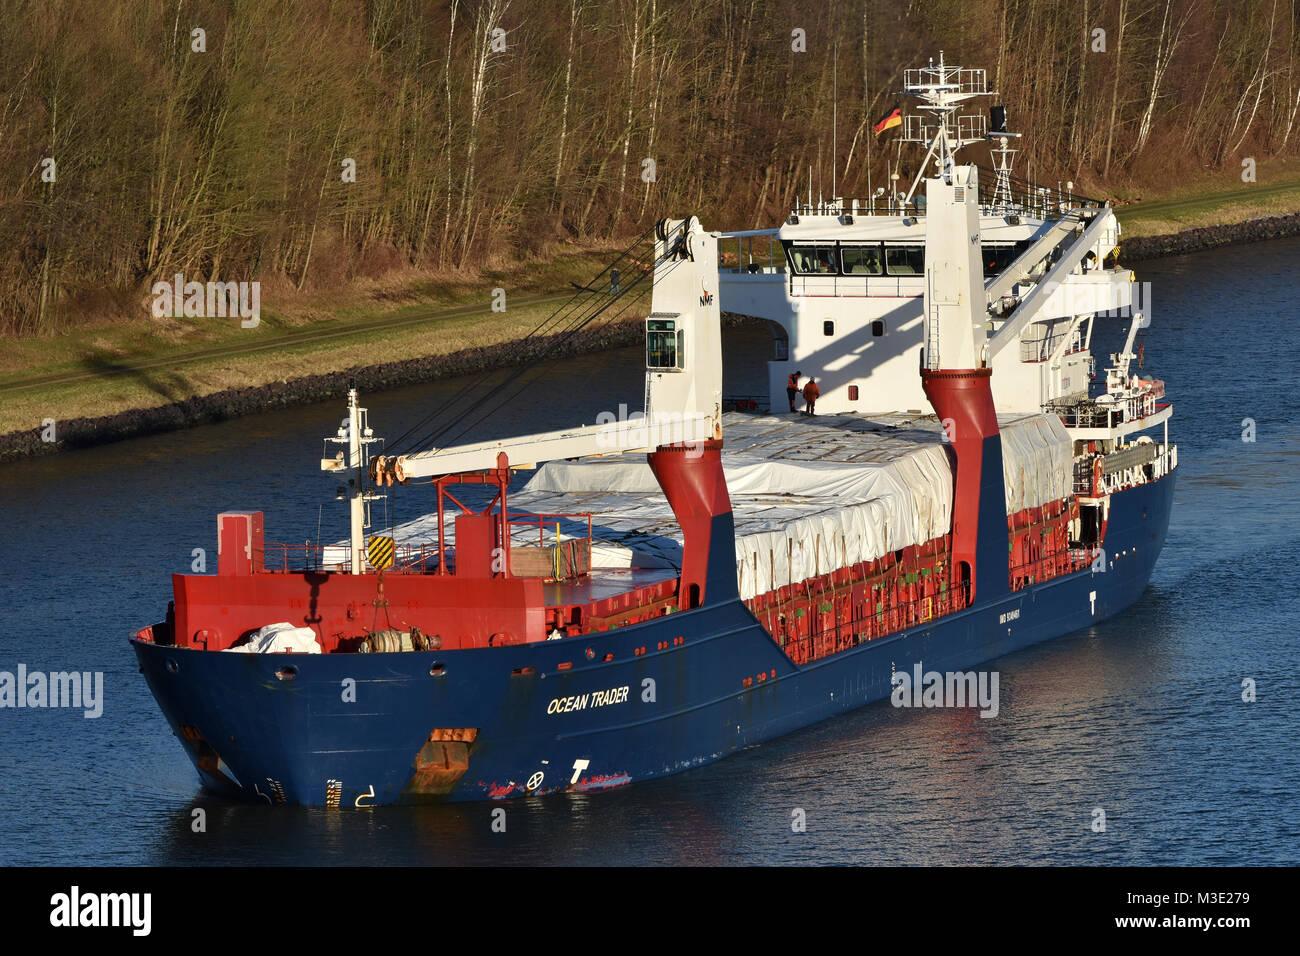 Ocean Trader - Stock Image